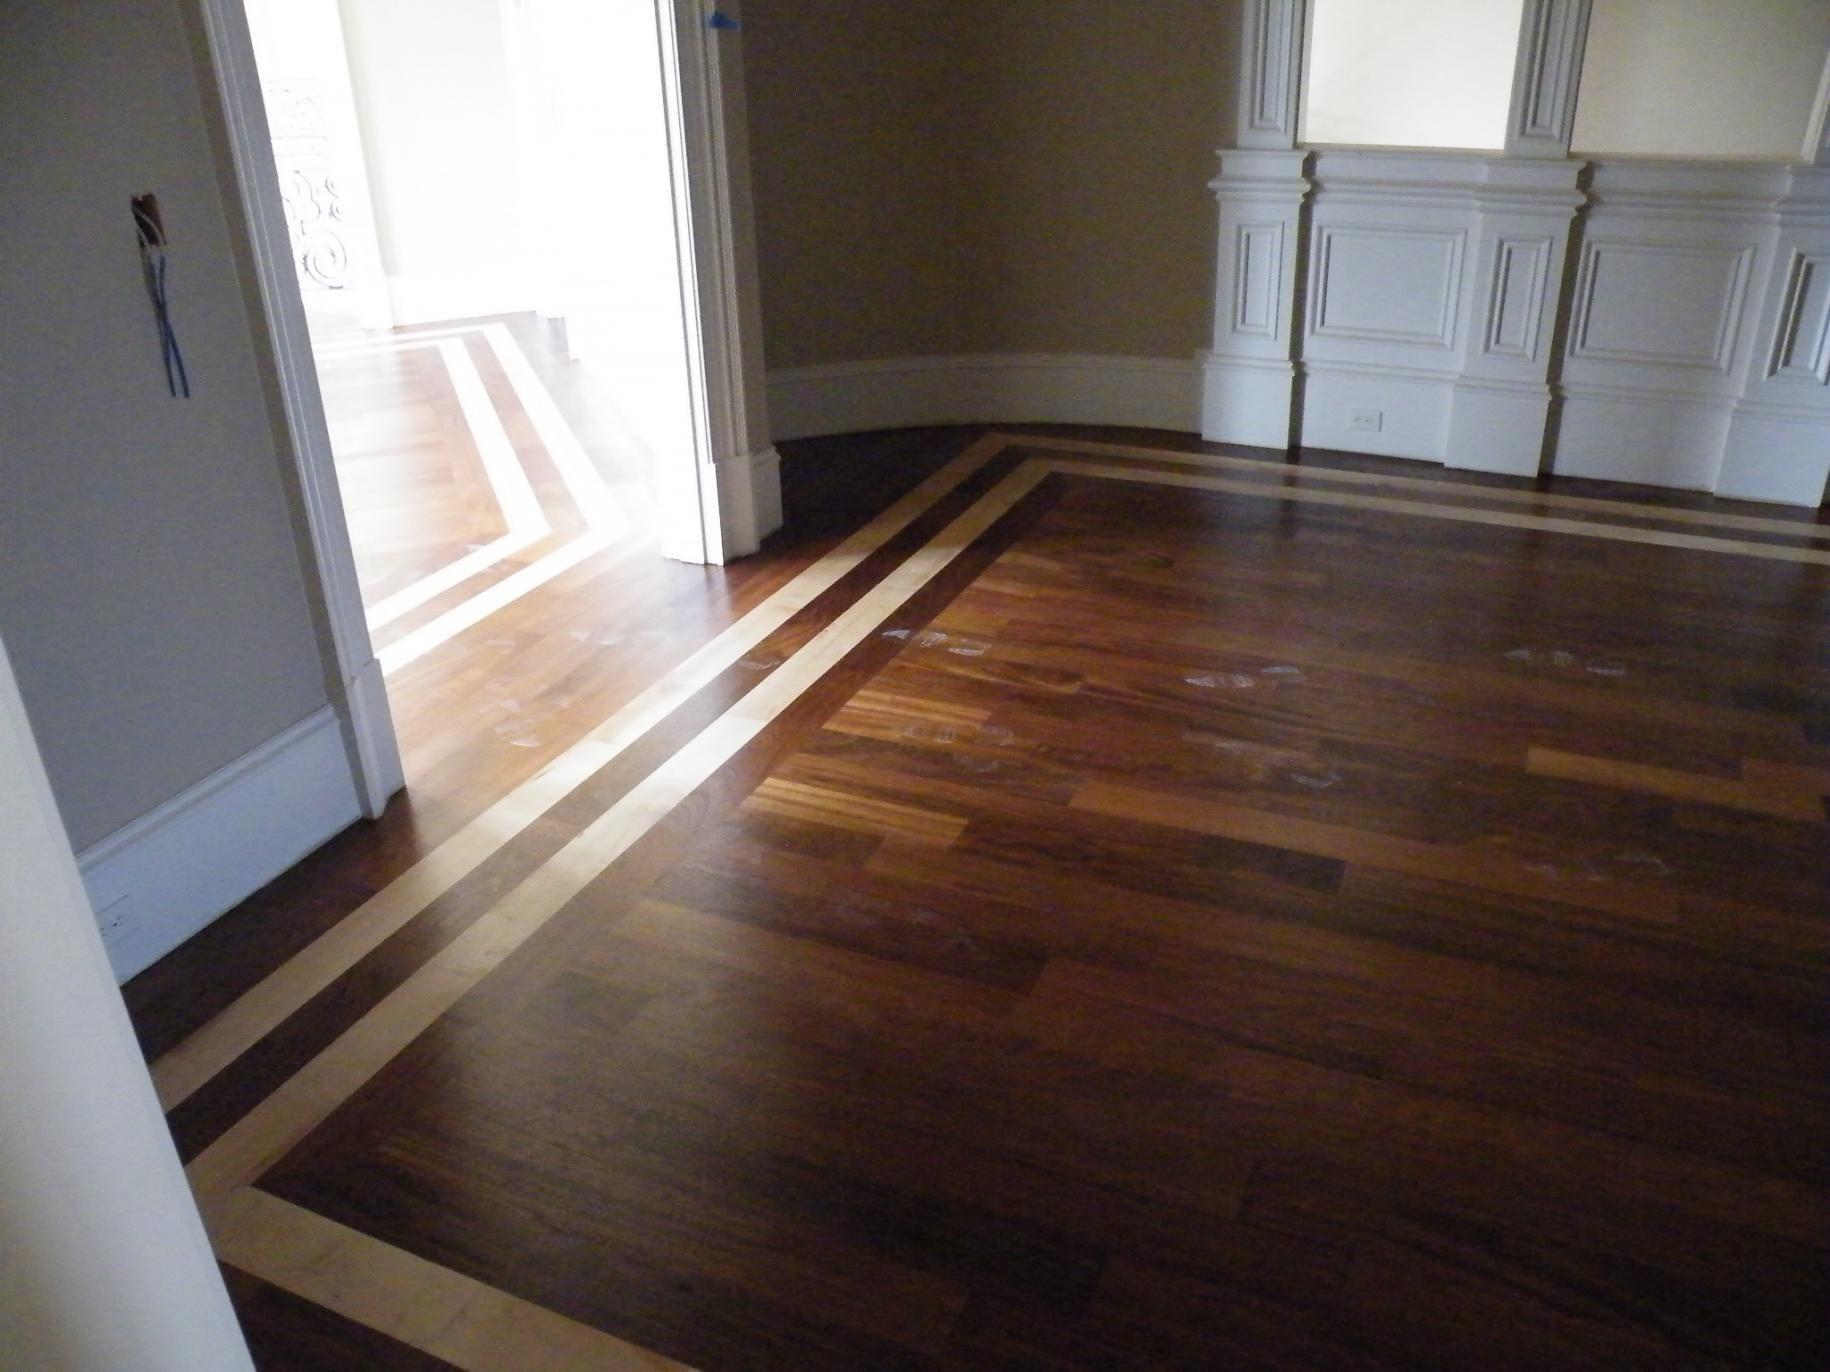 hardwood floors unlimited nj of wood floor borders hardwood floor inlay flooring contractor for wood floor borders hardwood floor inlay flooring contractor talk